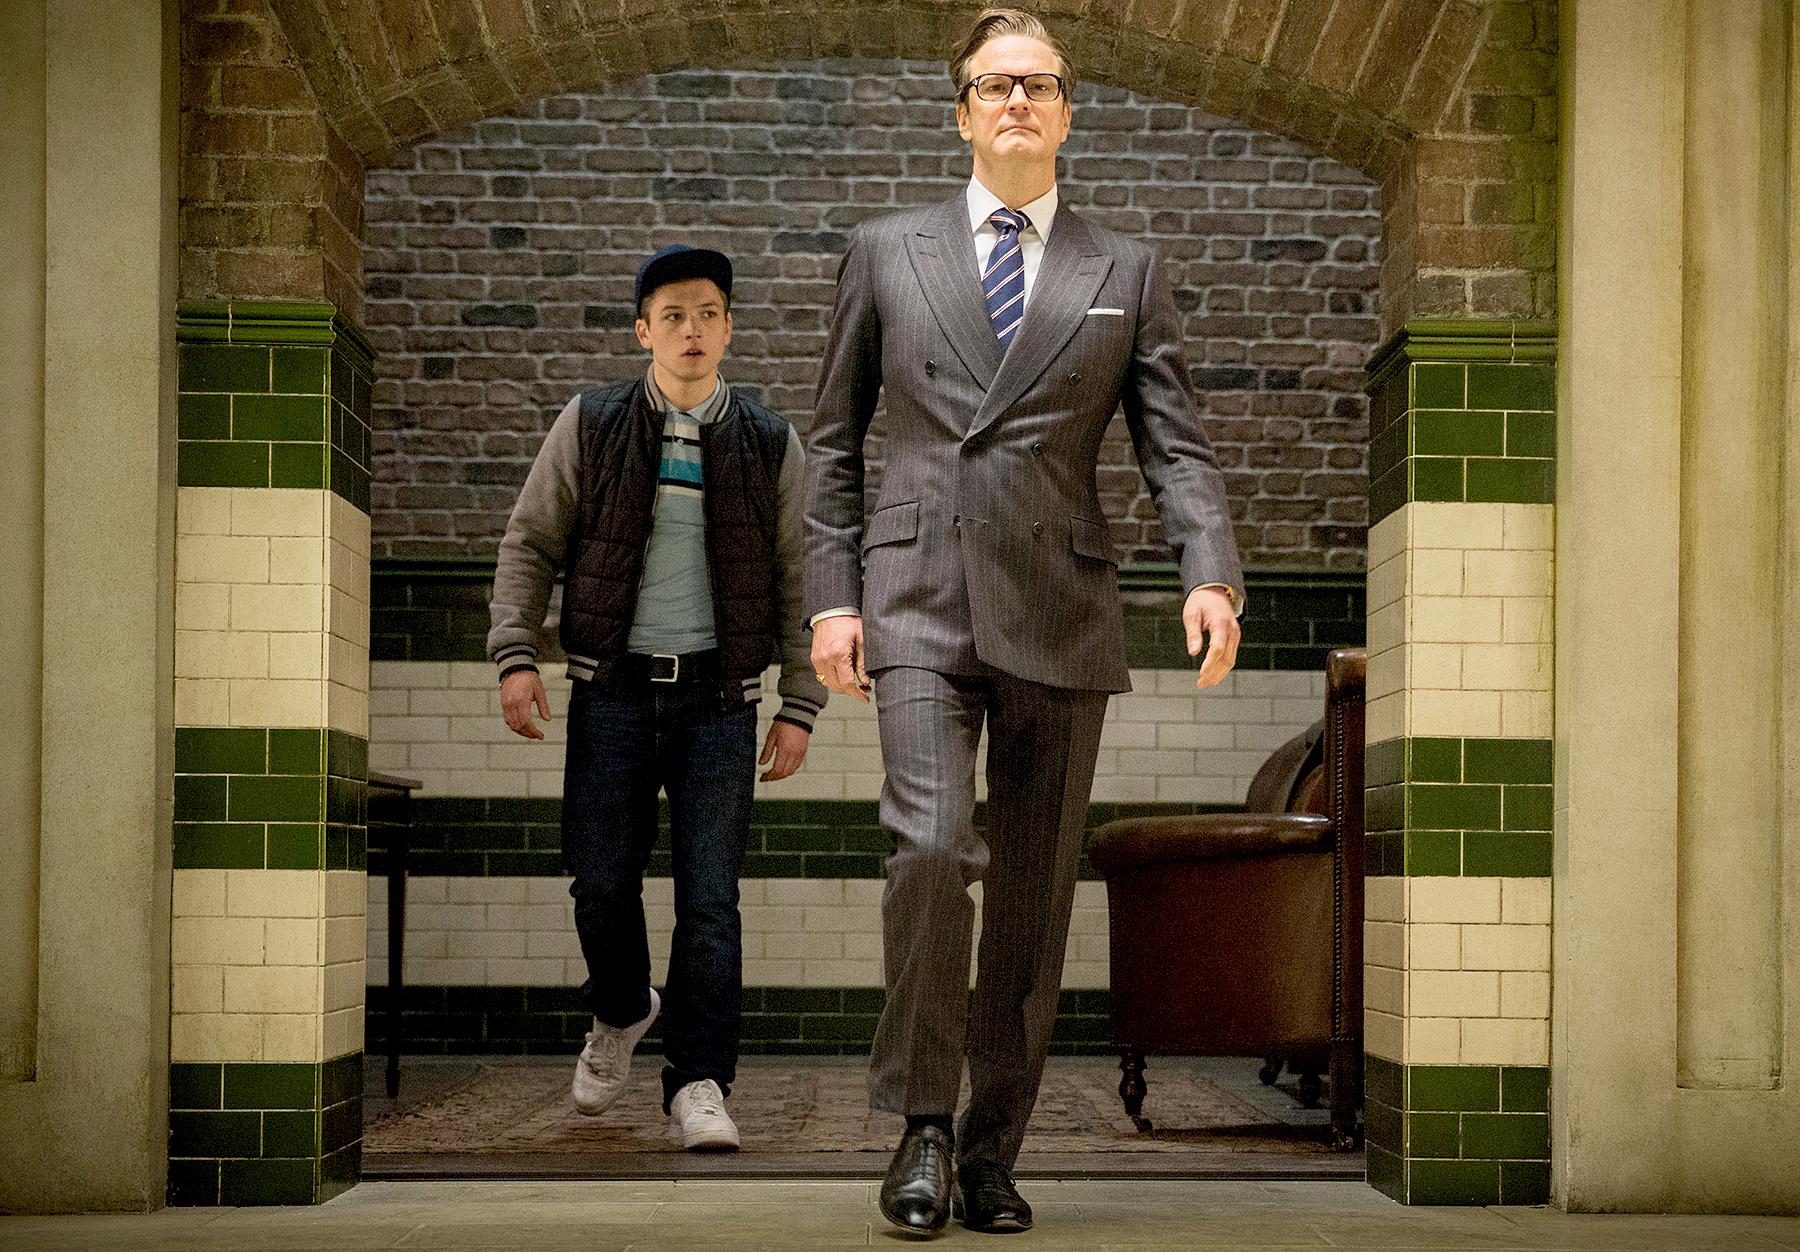 Colin Firth and Taron Egerton in Kingsmen: Secret Service